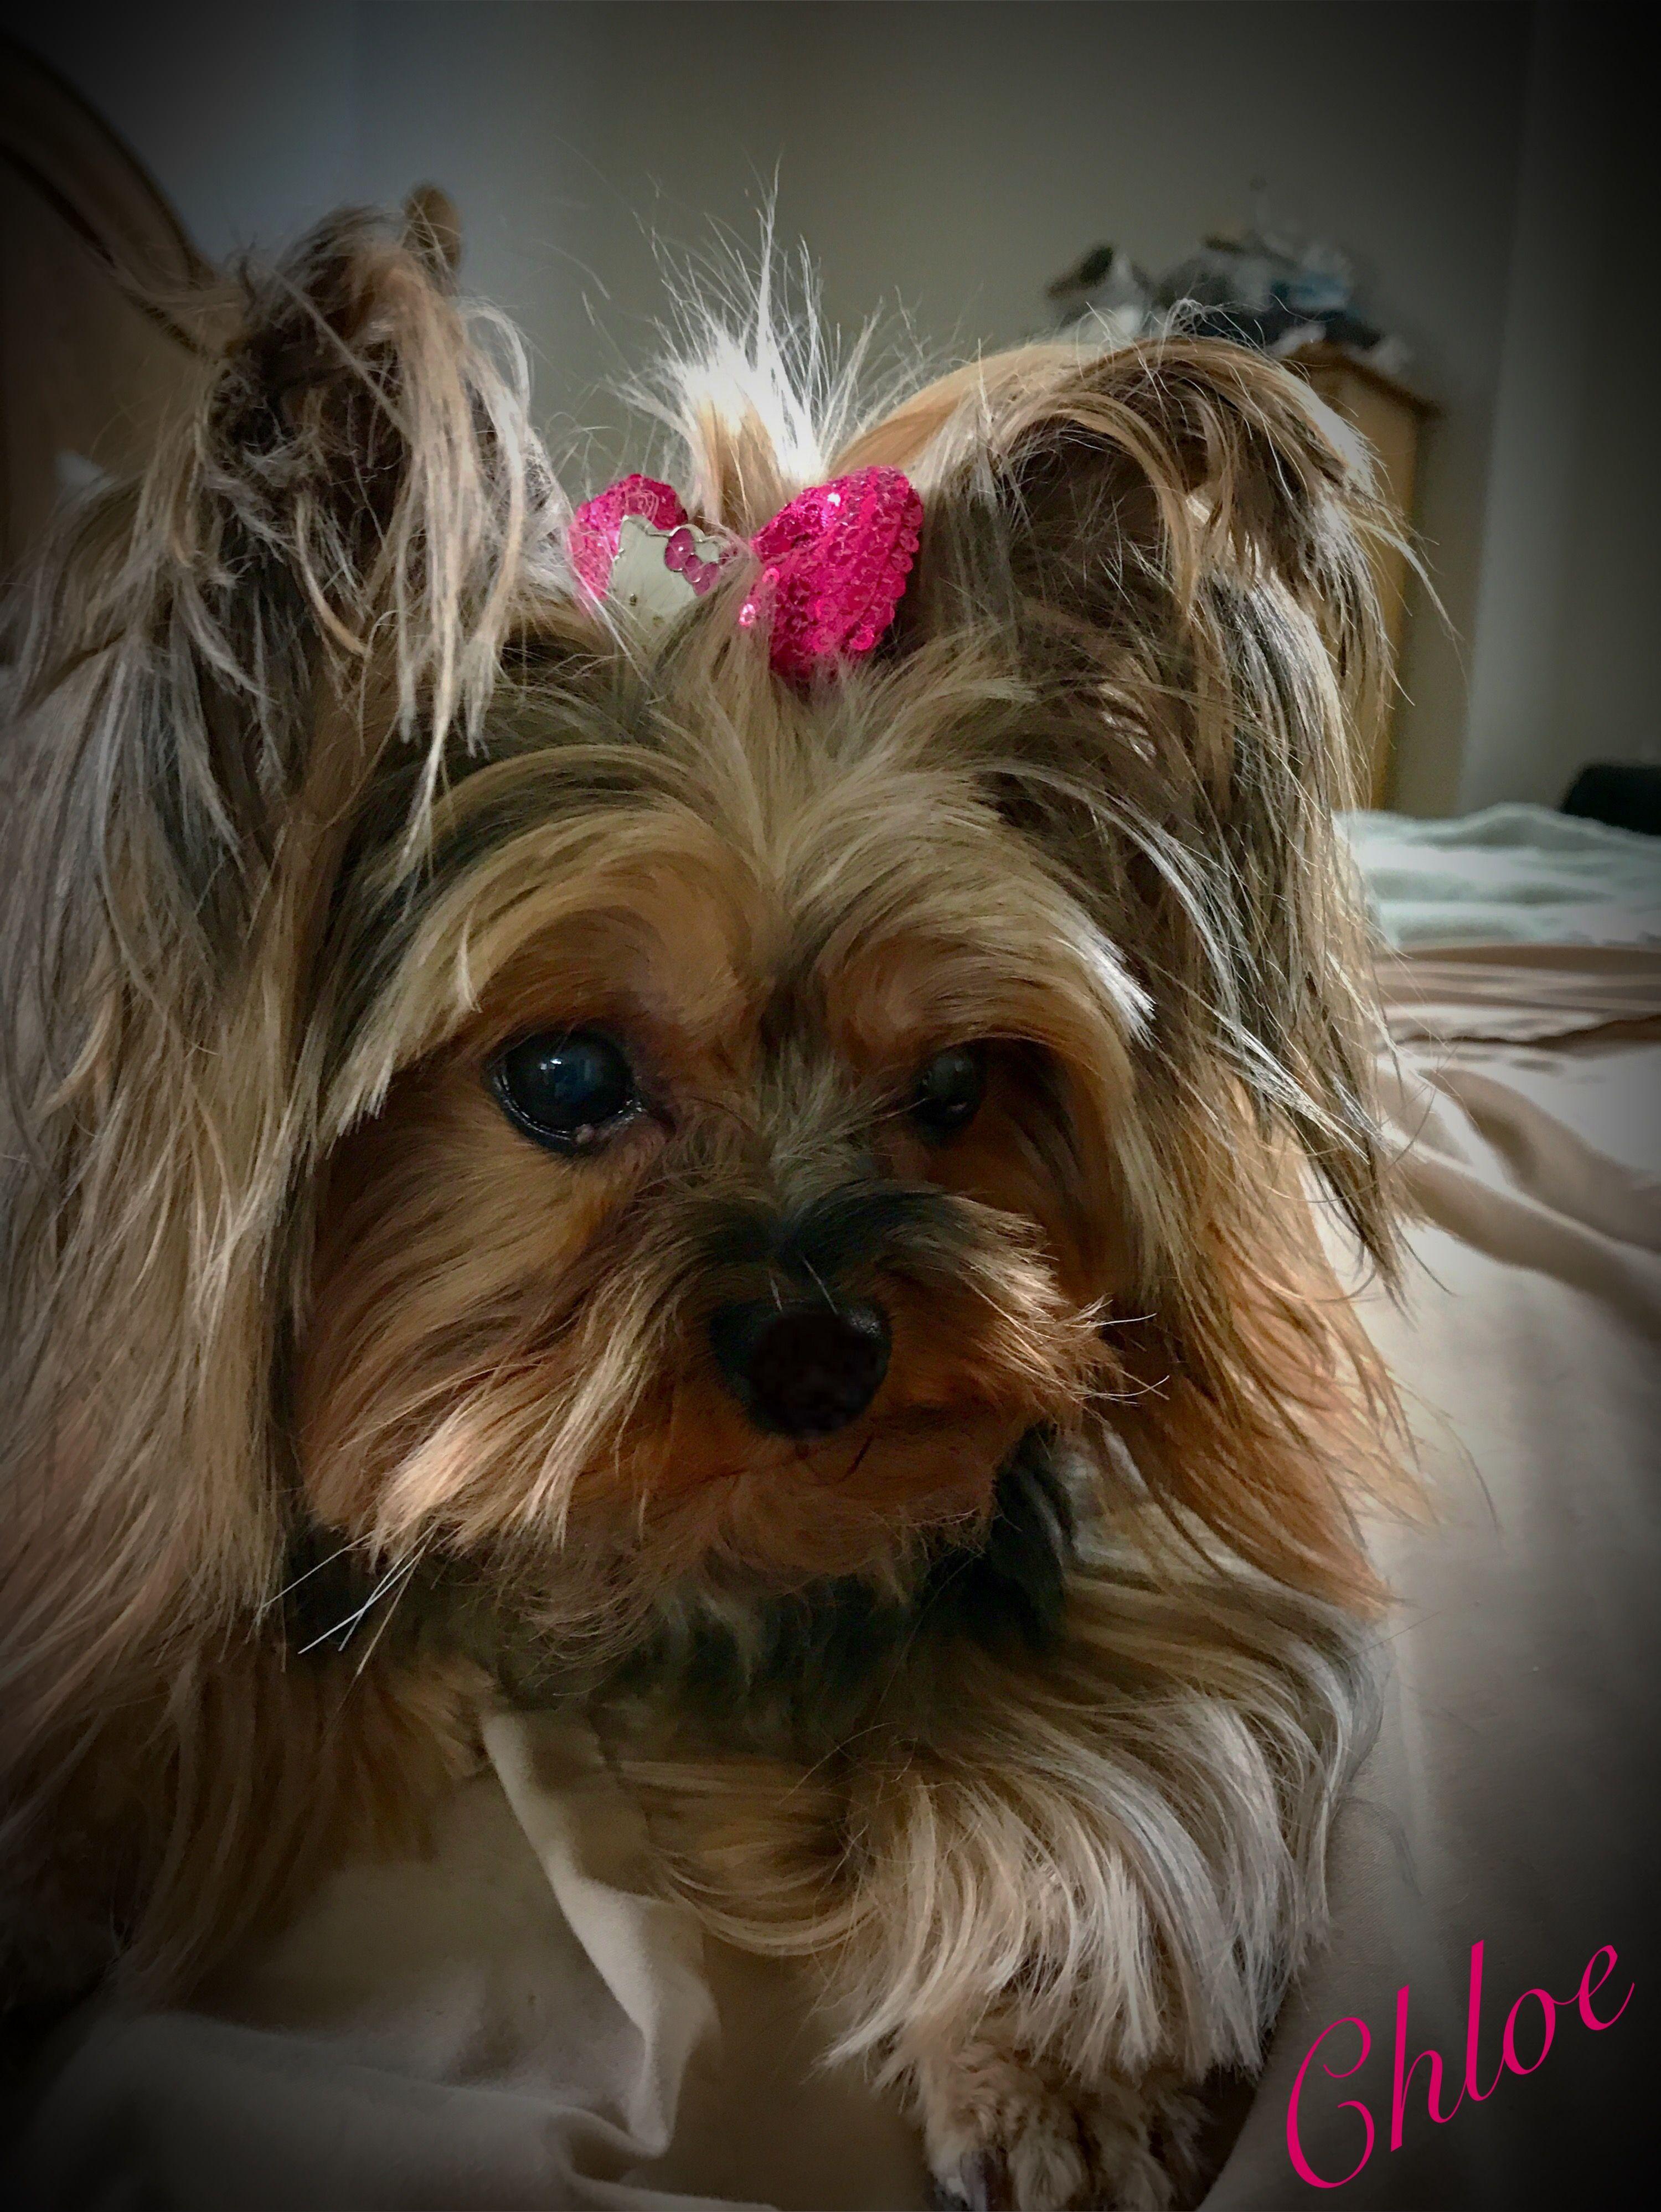 My live sweet teddy bear...Chloe💖 Yorkshire terrier